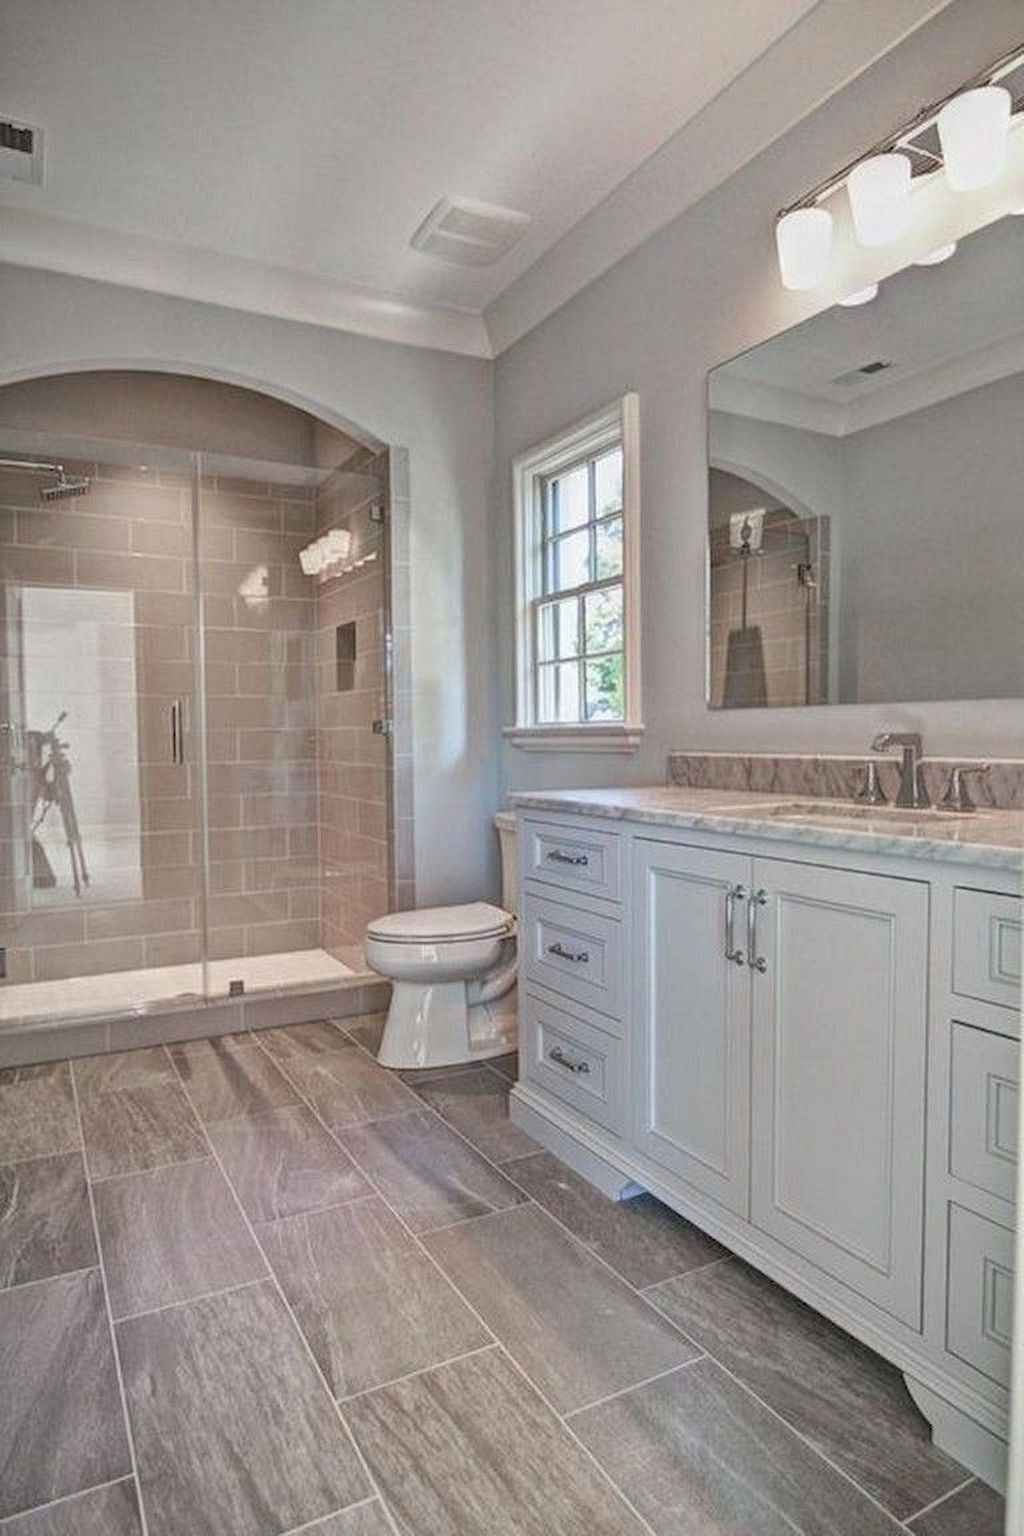 32 Best Small Bathroom Design Ideas And Decorations For 2020: 32 Awesome Farmhouse Bathroom Tile Floor Decor Ideas In